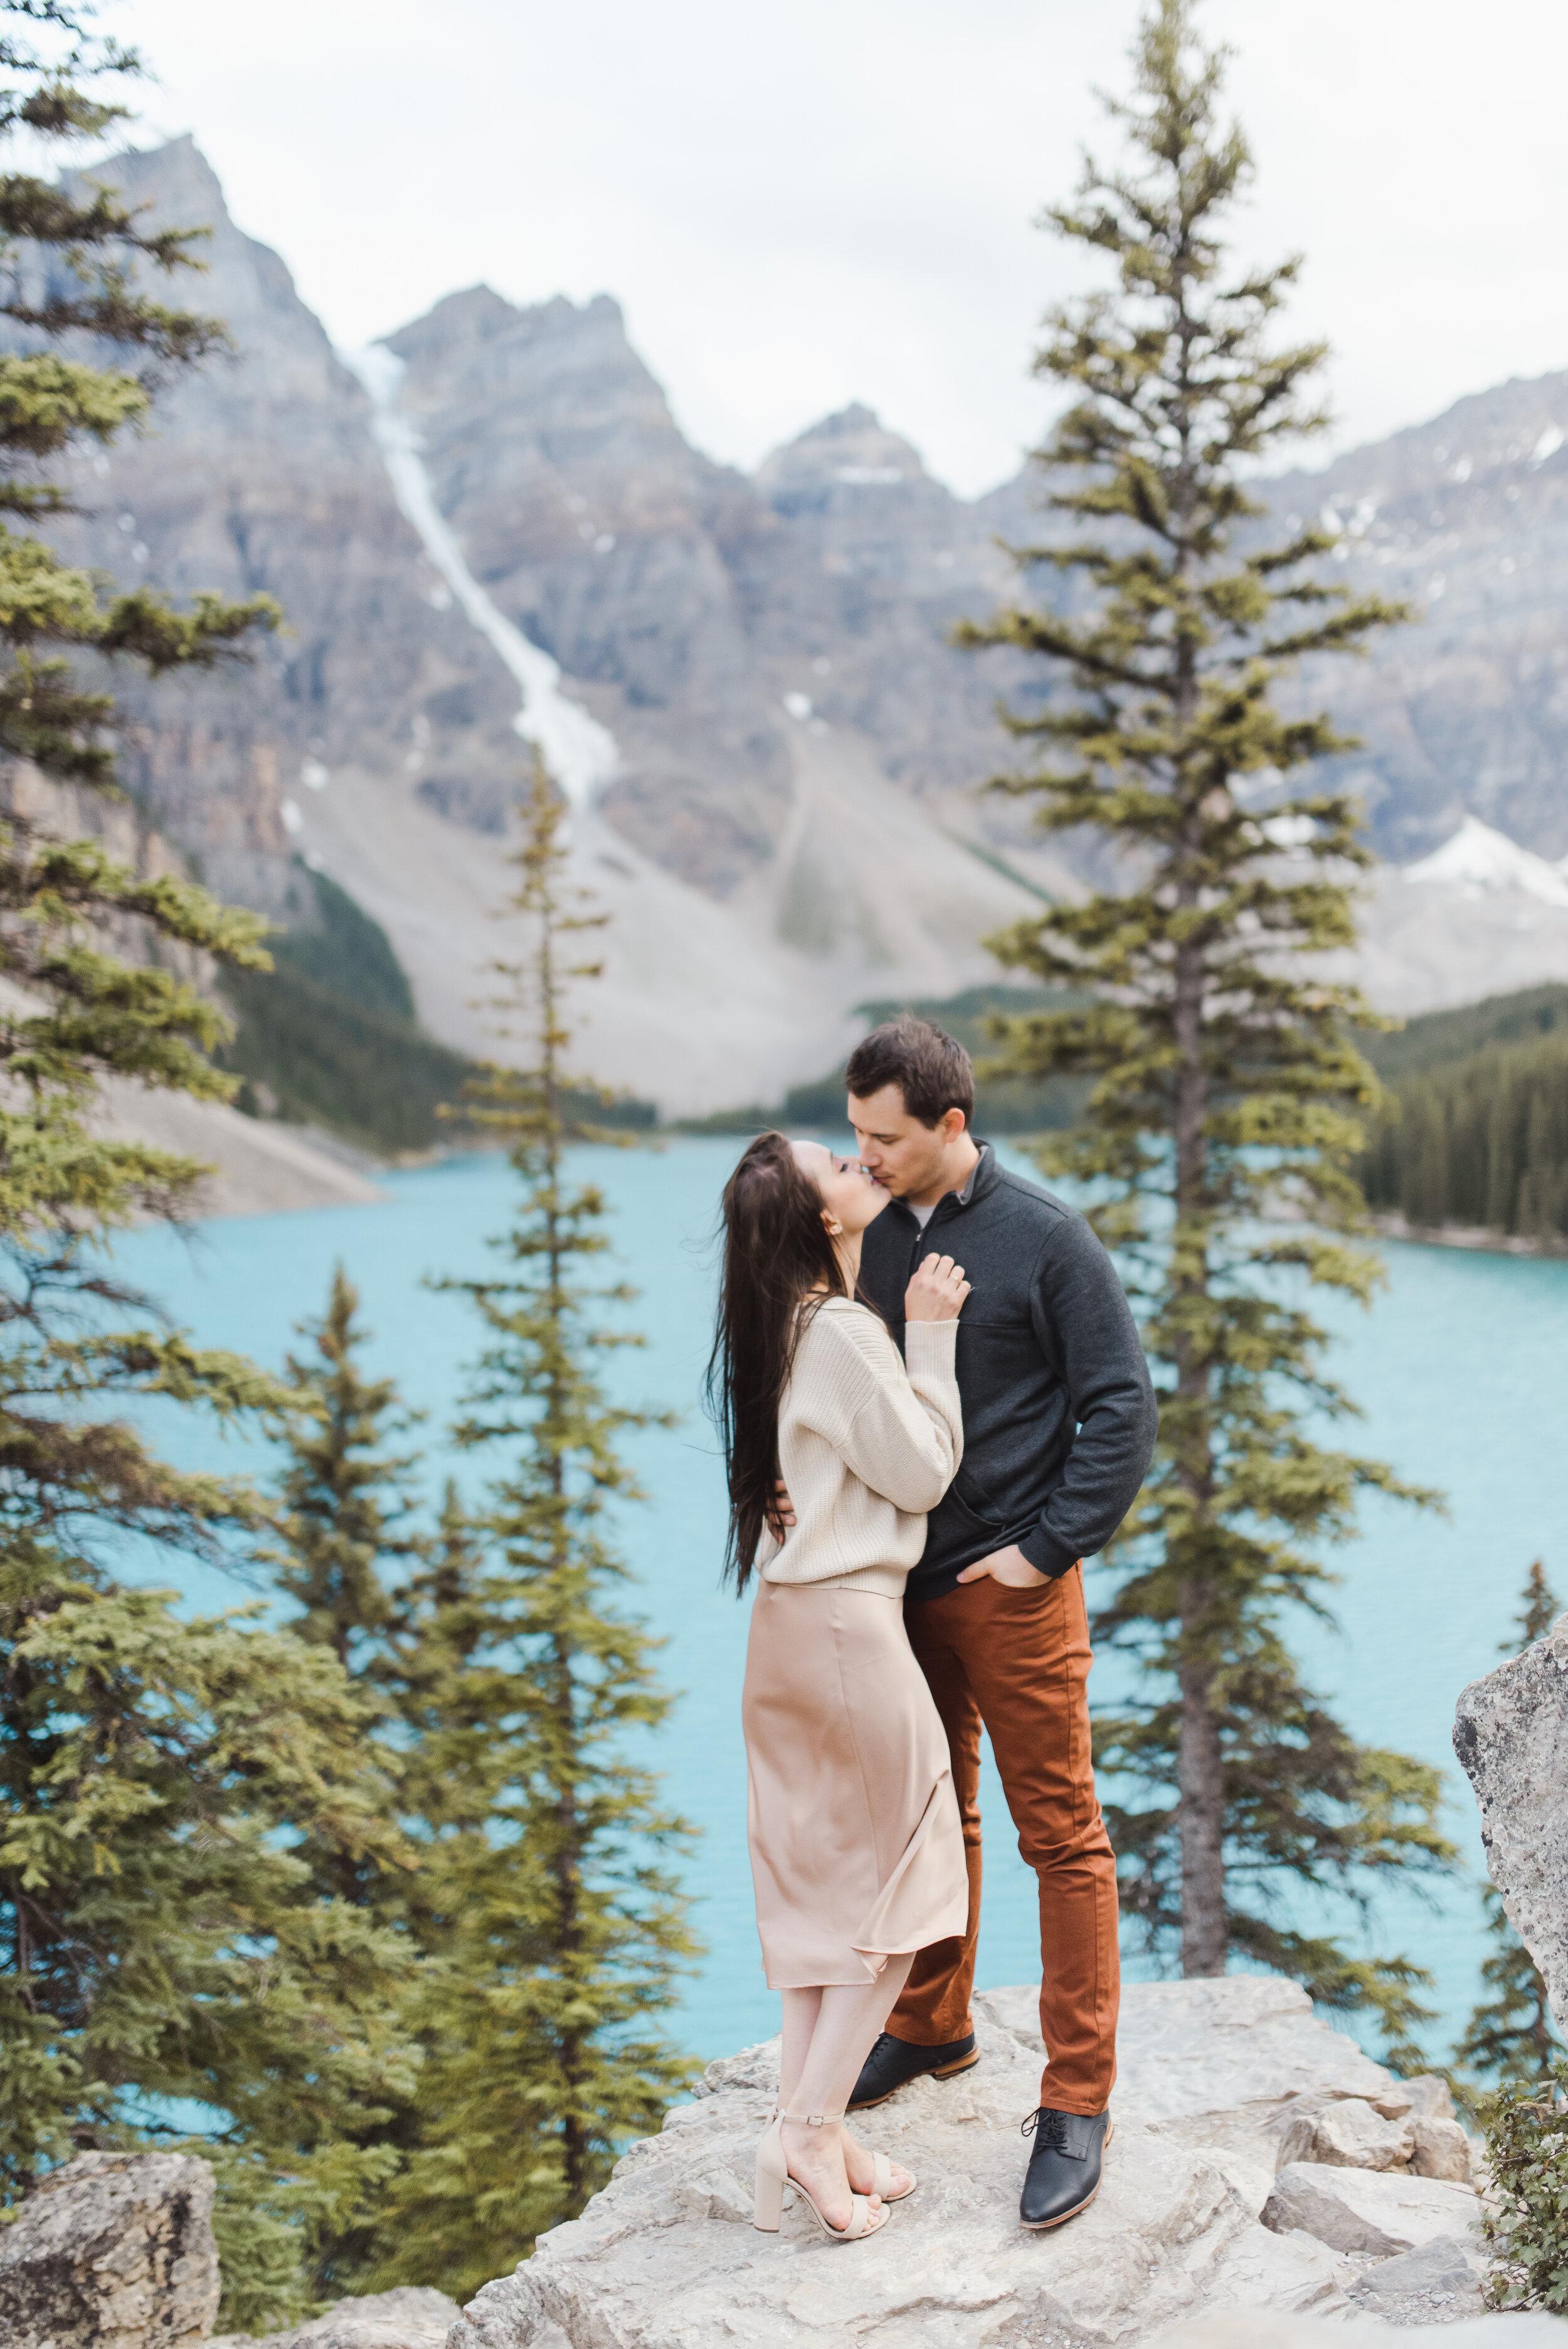 Calgary Wedding and Portrait Photographer